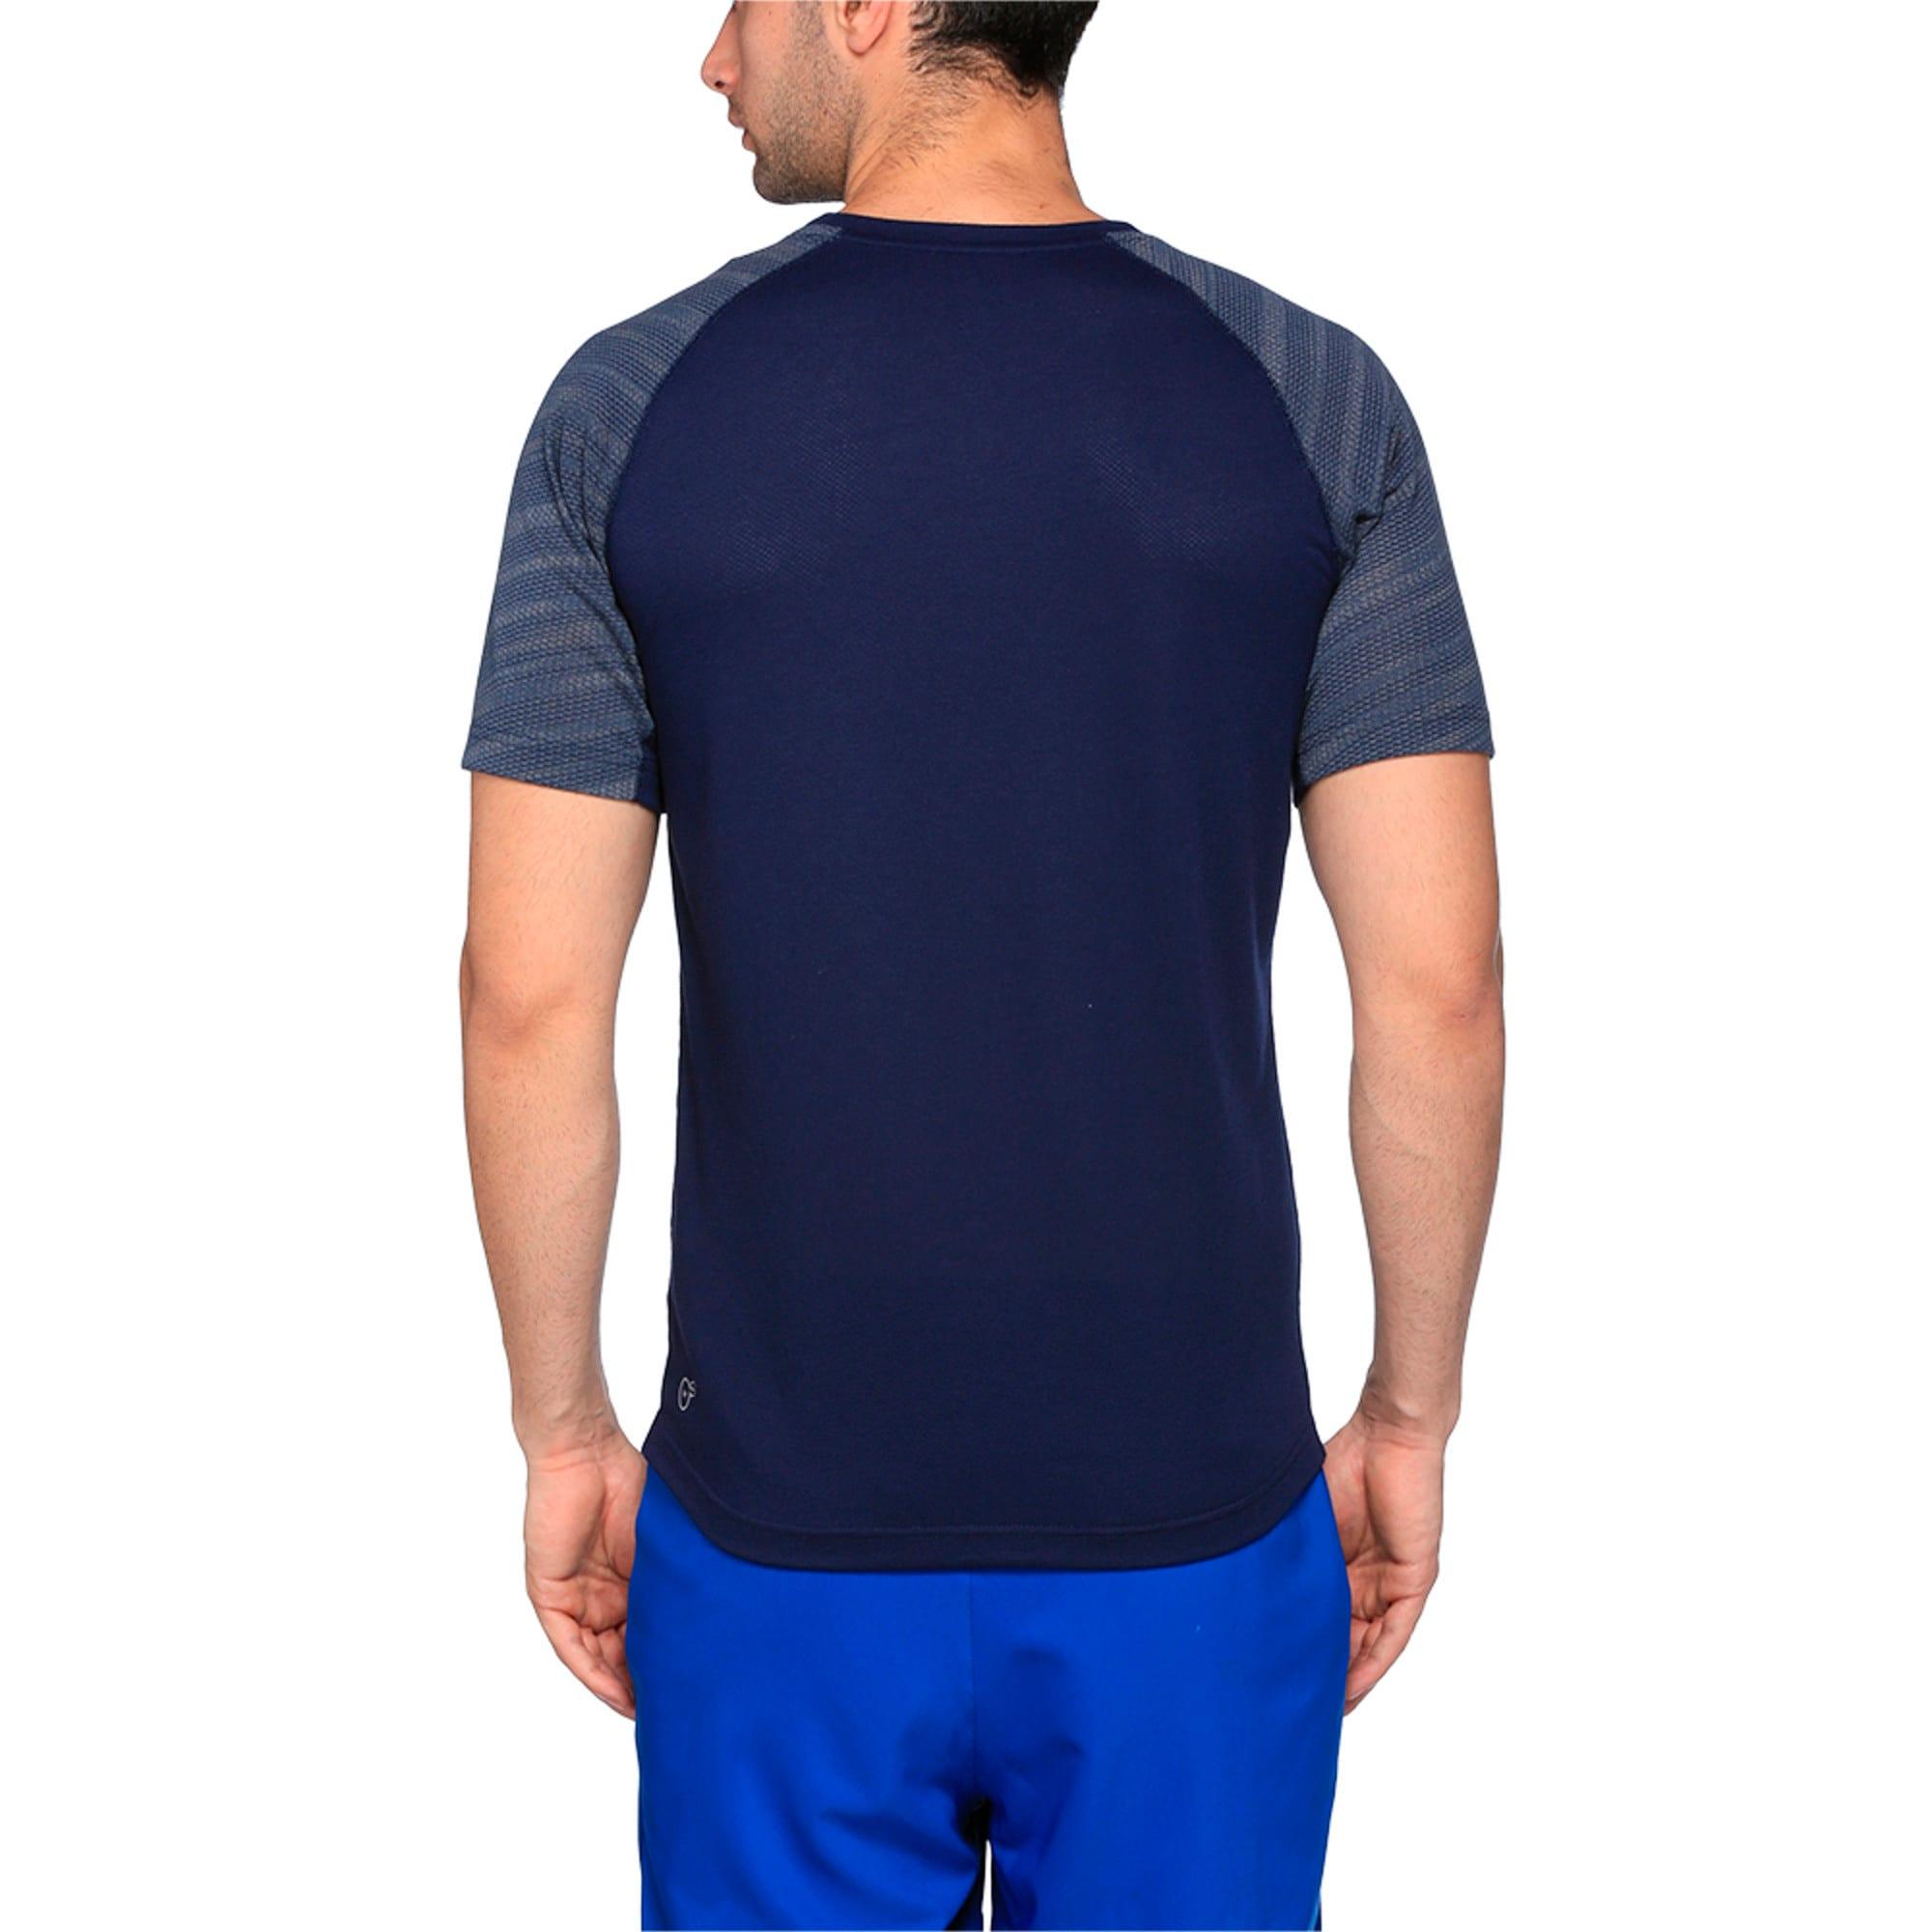 Thumbnail 5 of Active Training Dri-Release® T-Shirt, Peacoat, medium-IND